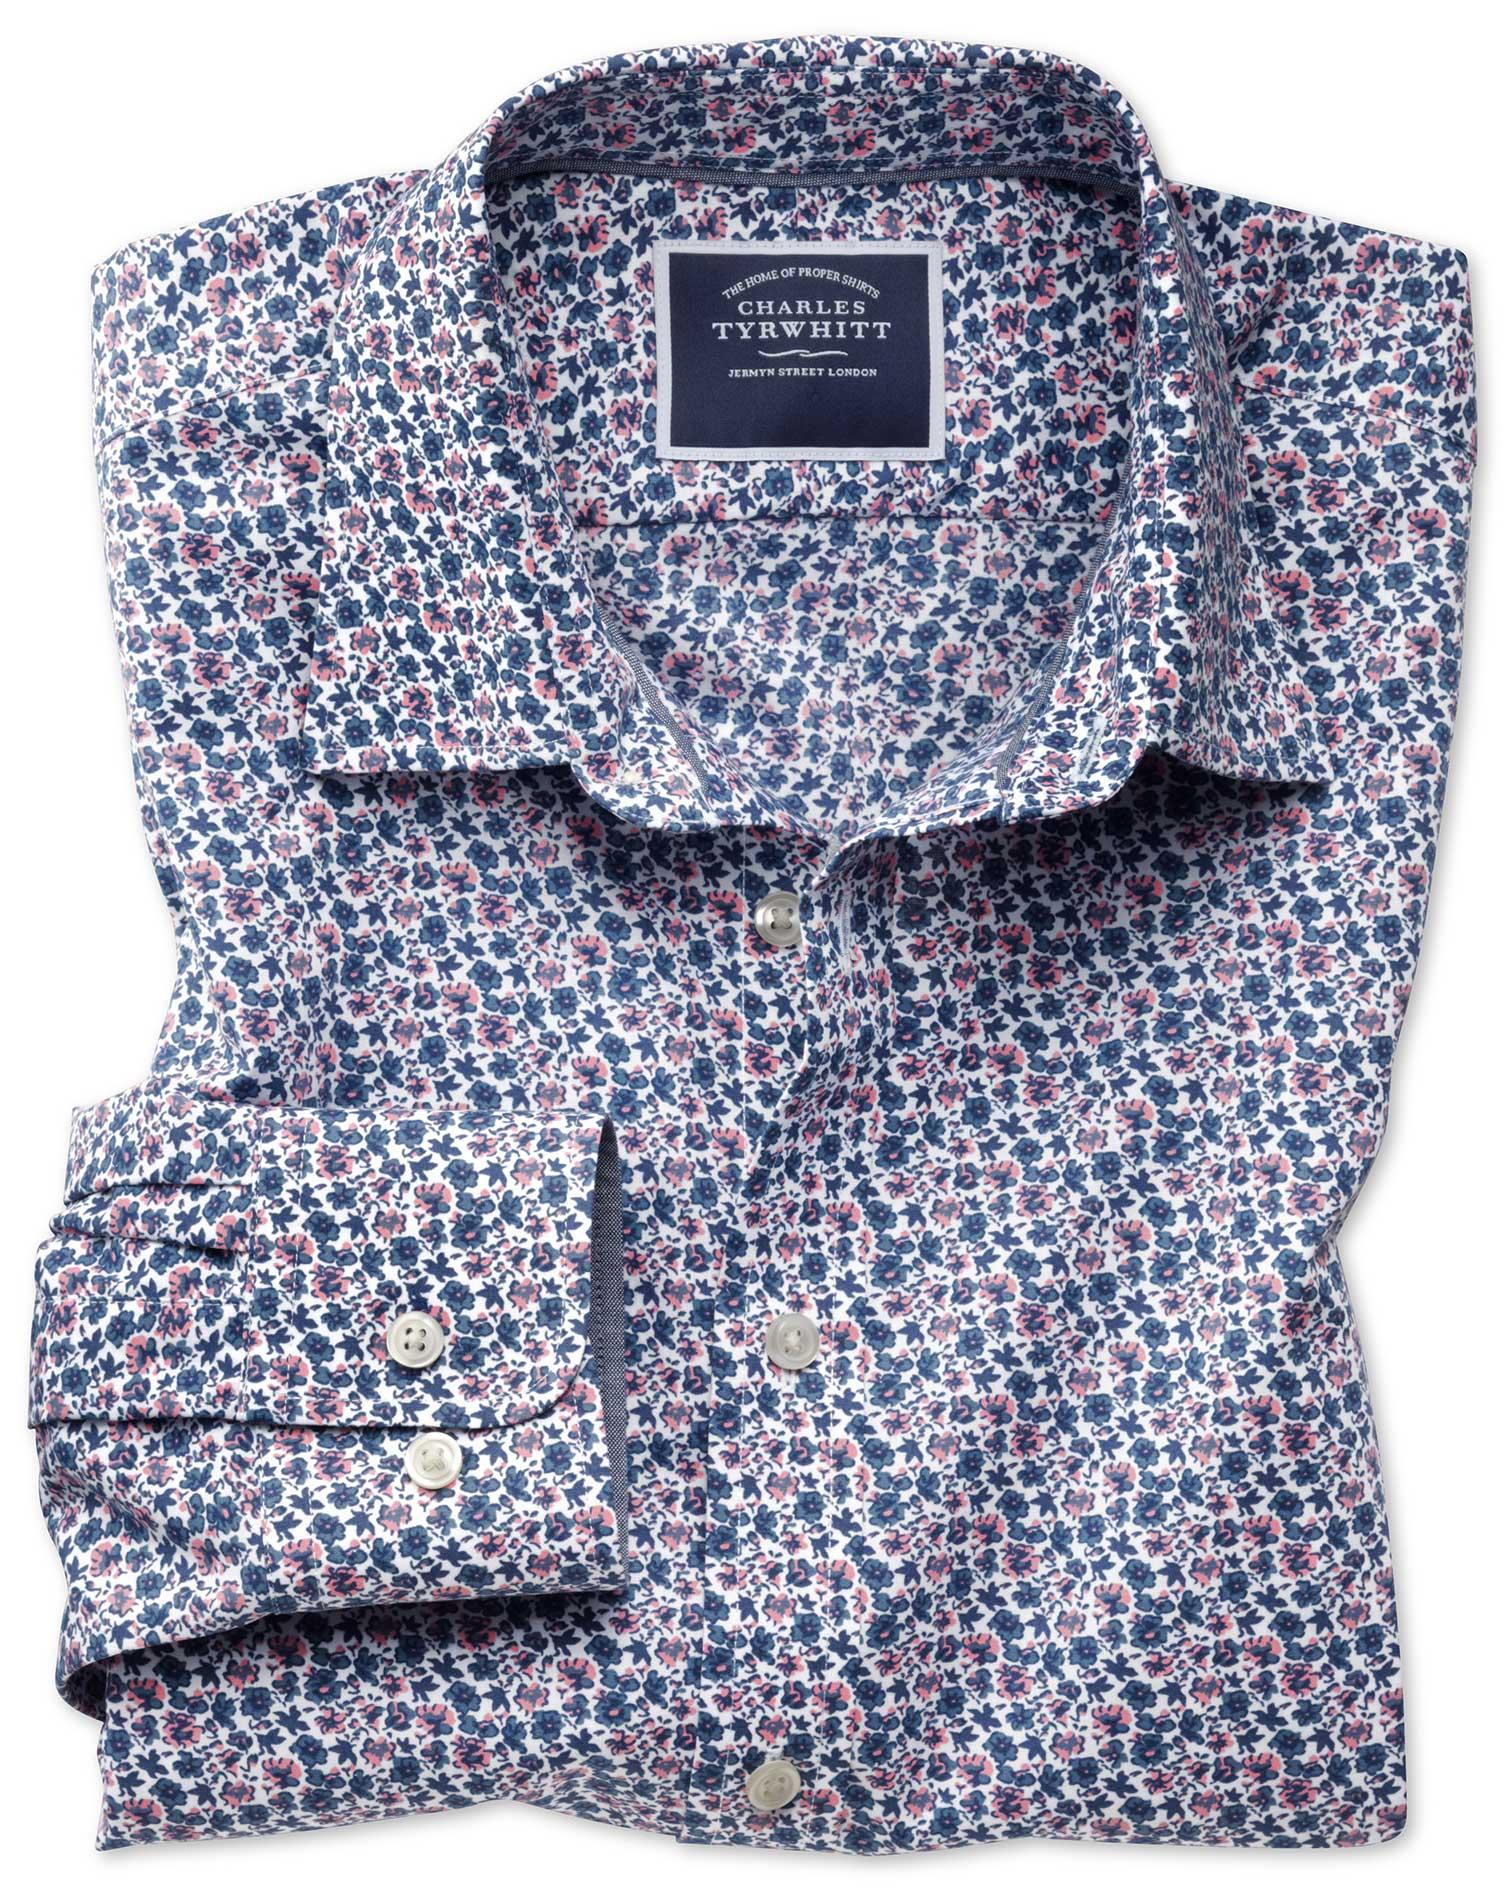 Slim Fit Non-Iron Poplin Pink Multi Floral Print Cotton Shirt Single Cuff Size Medium by Charles Tyr